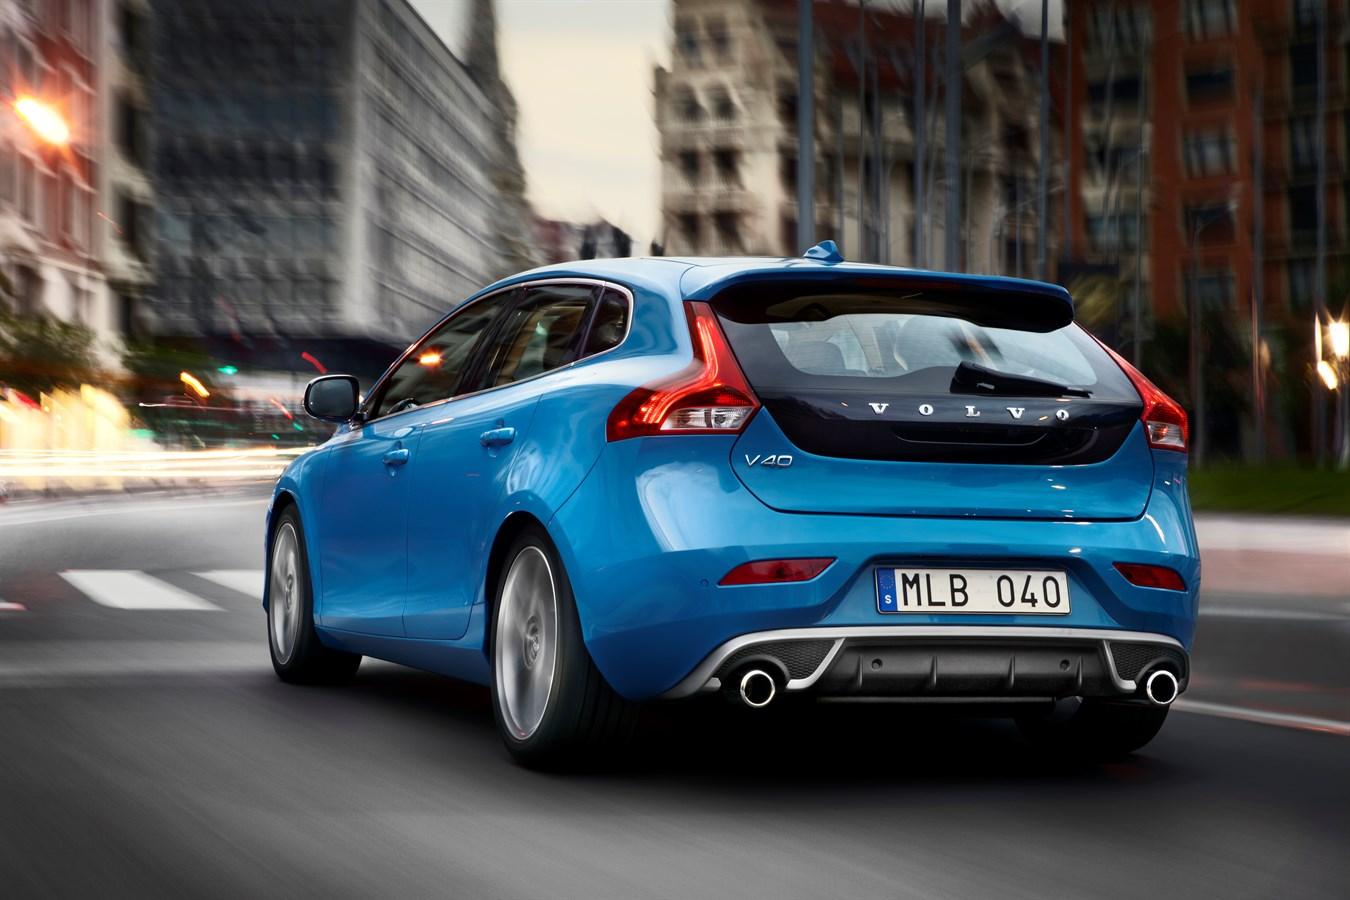 The new Volvo V40 R-Design